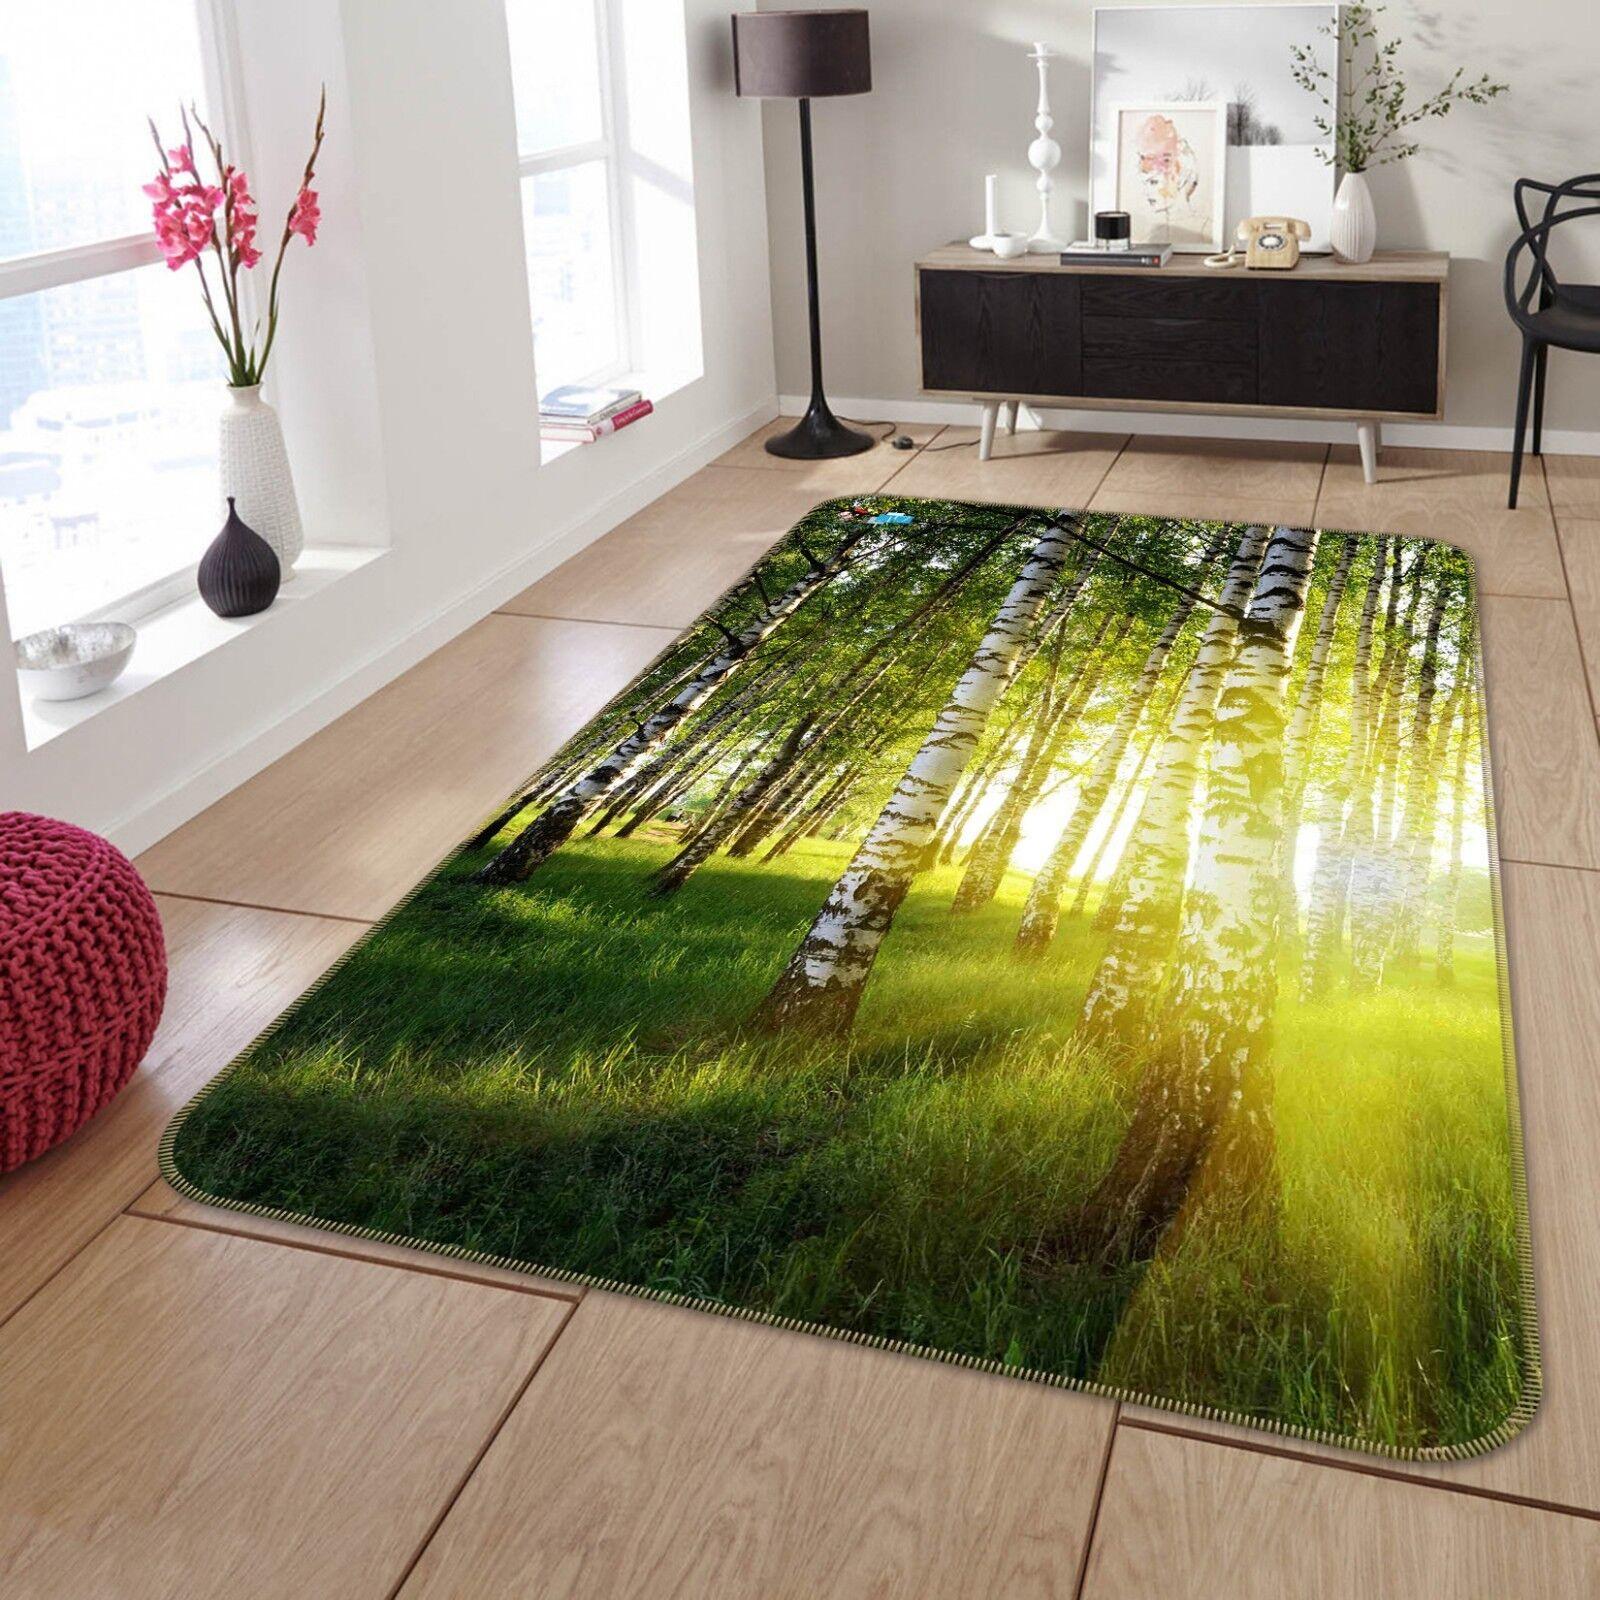 3D Forest Sunshine 688 Non Non Non Slip Rug Mat Room Mat Quality Elegant Photo Carpet UK 4a905d